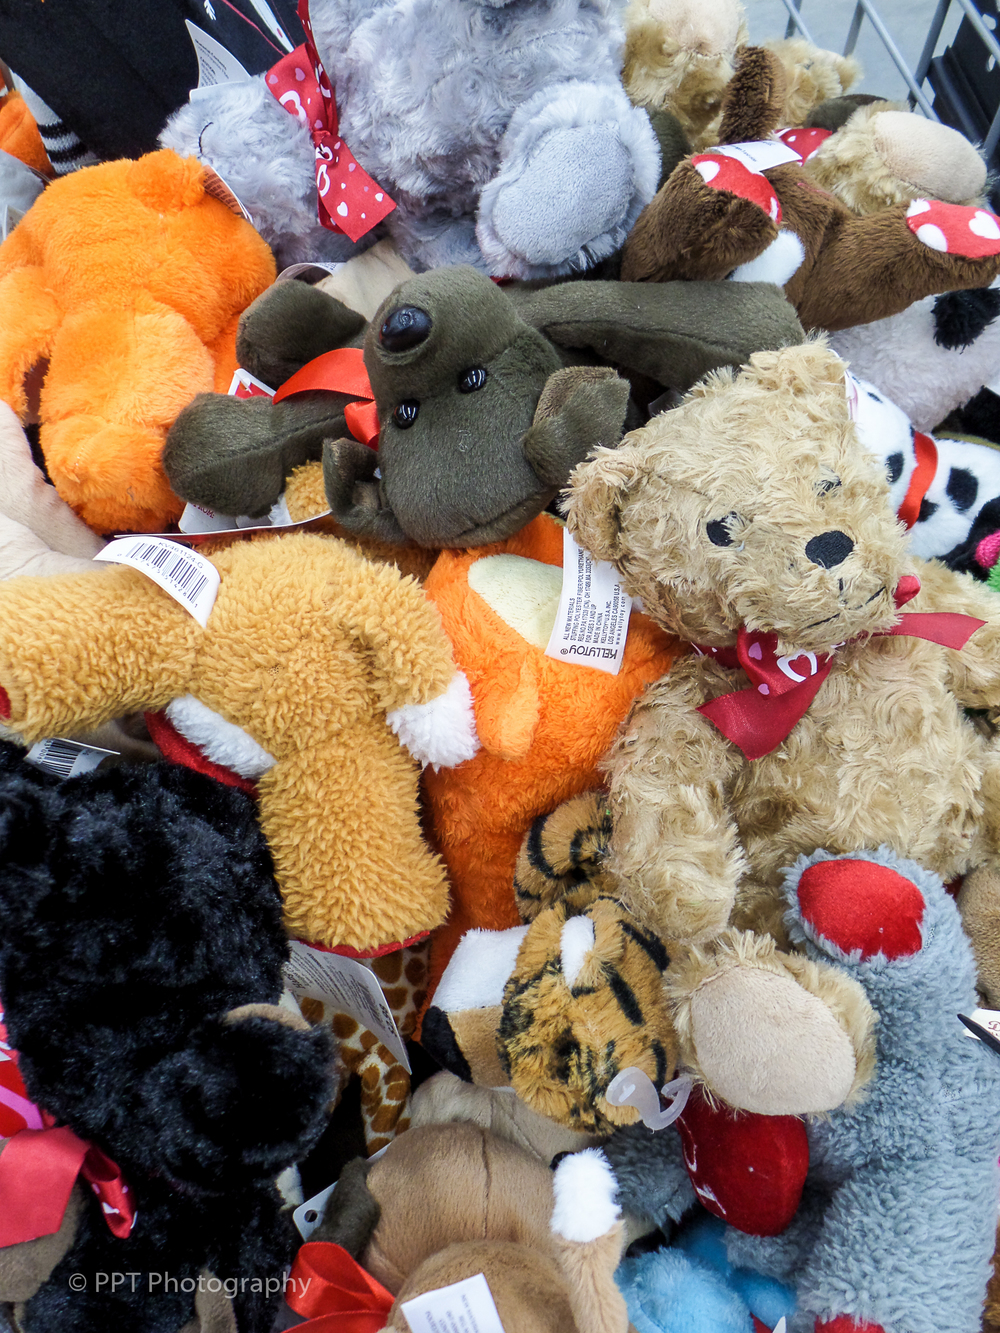 Stuffed animals on Valentines Day